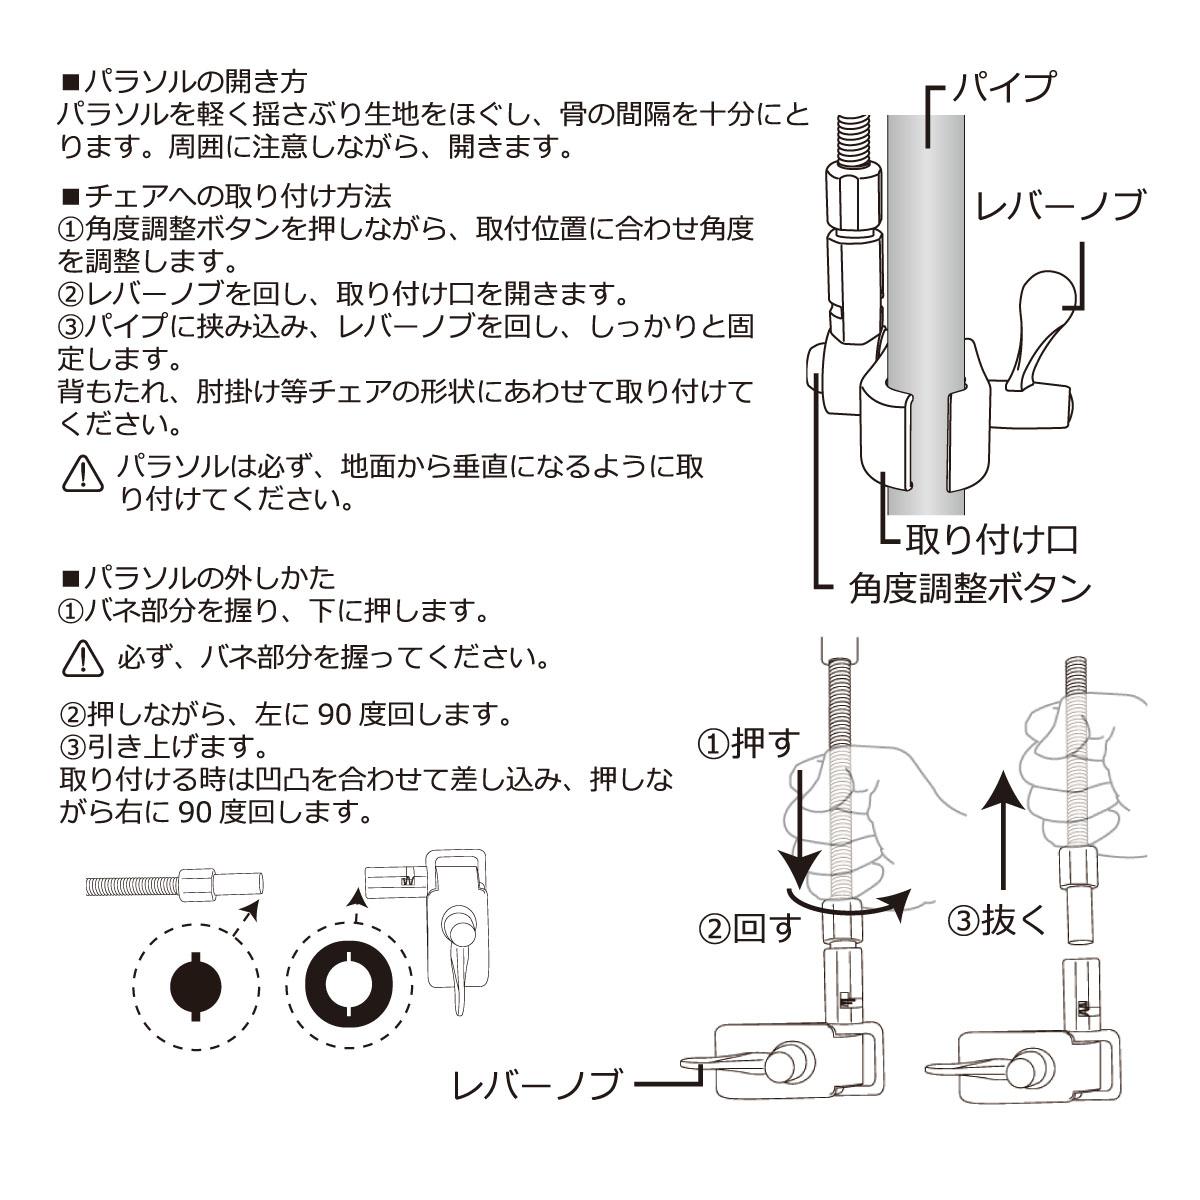 BD-851-3